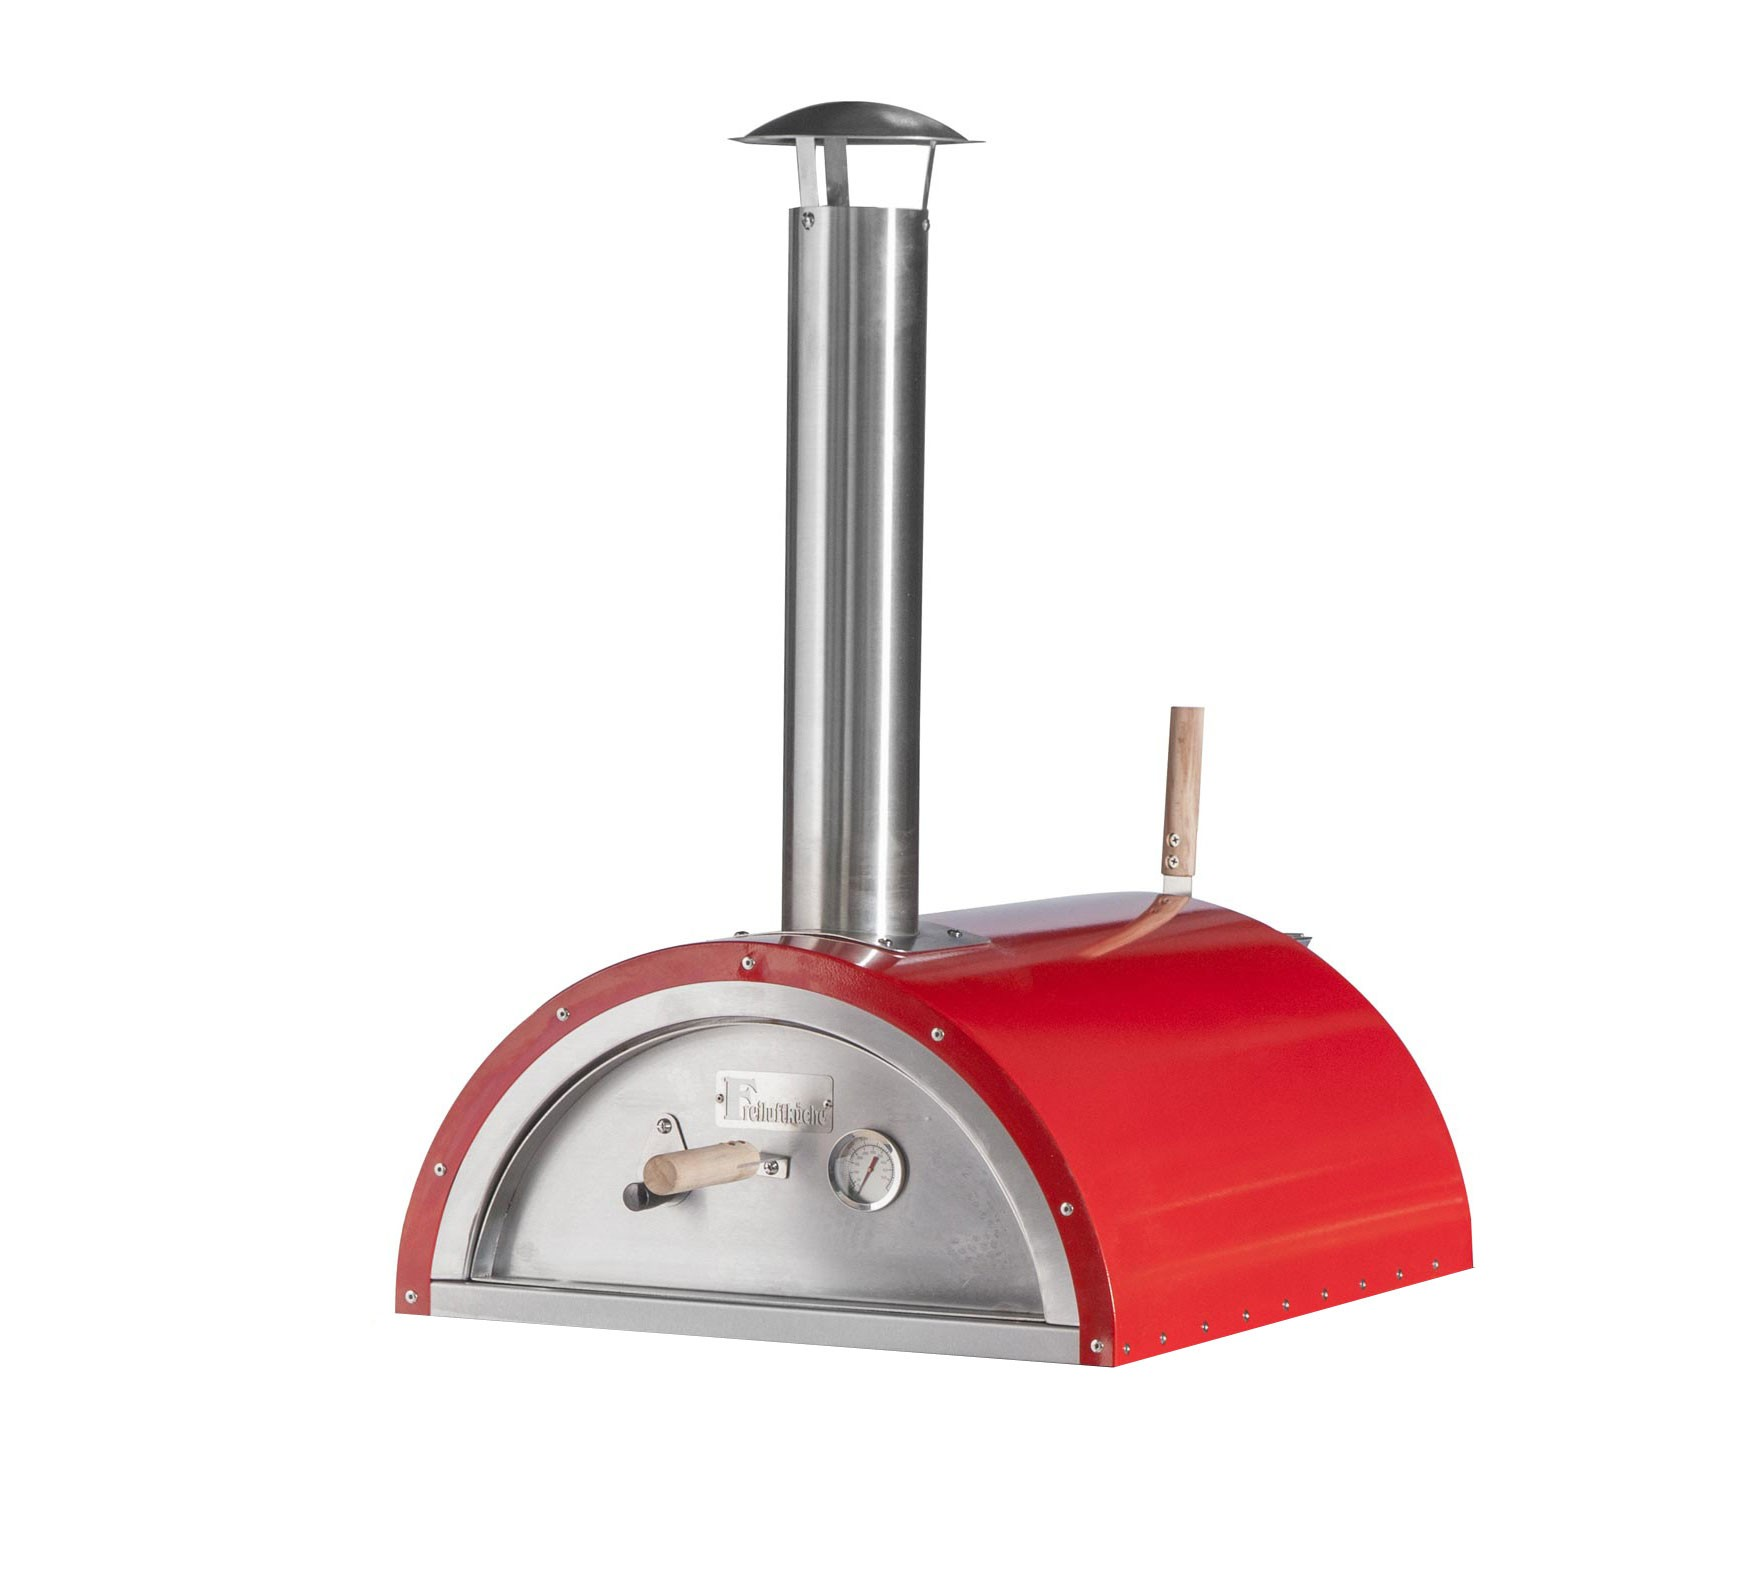 Pellet-Pizzaofen, Flammkuchenofen DaDa II rot Bild 1